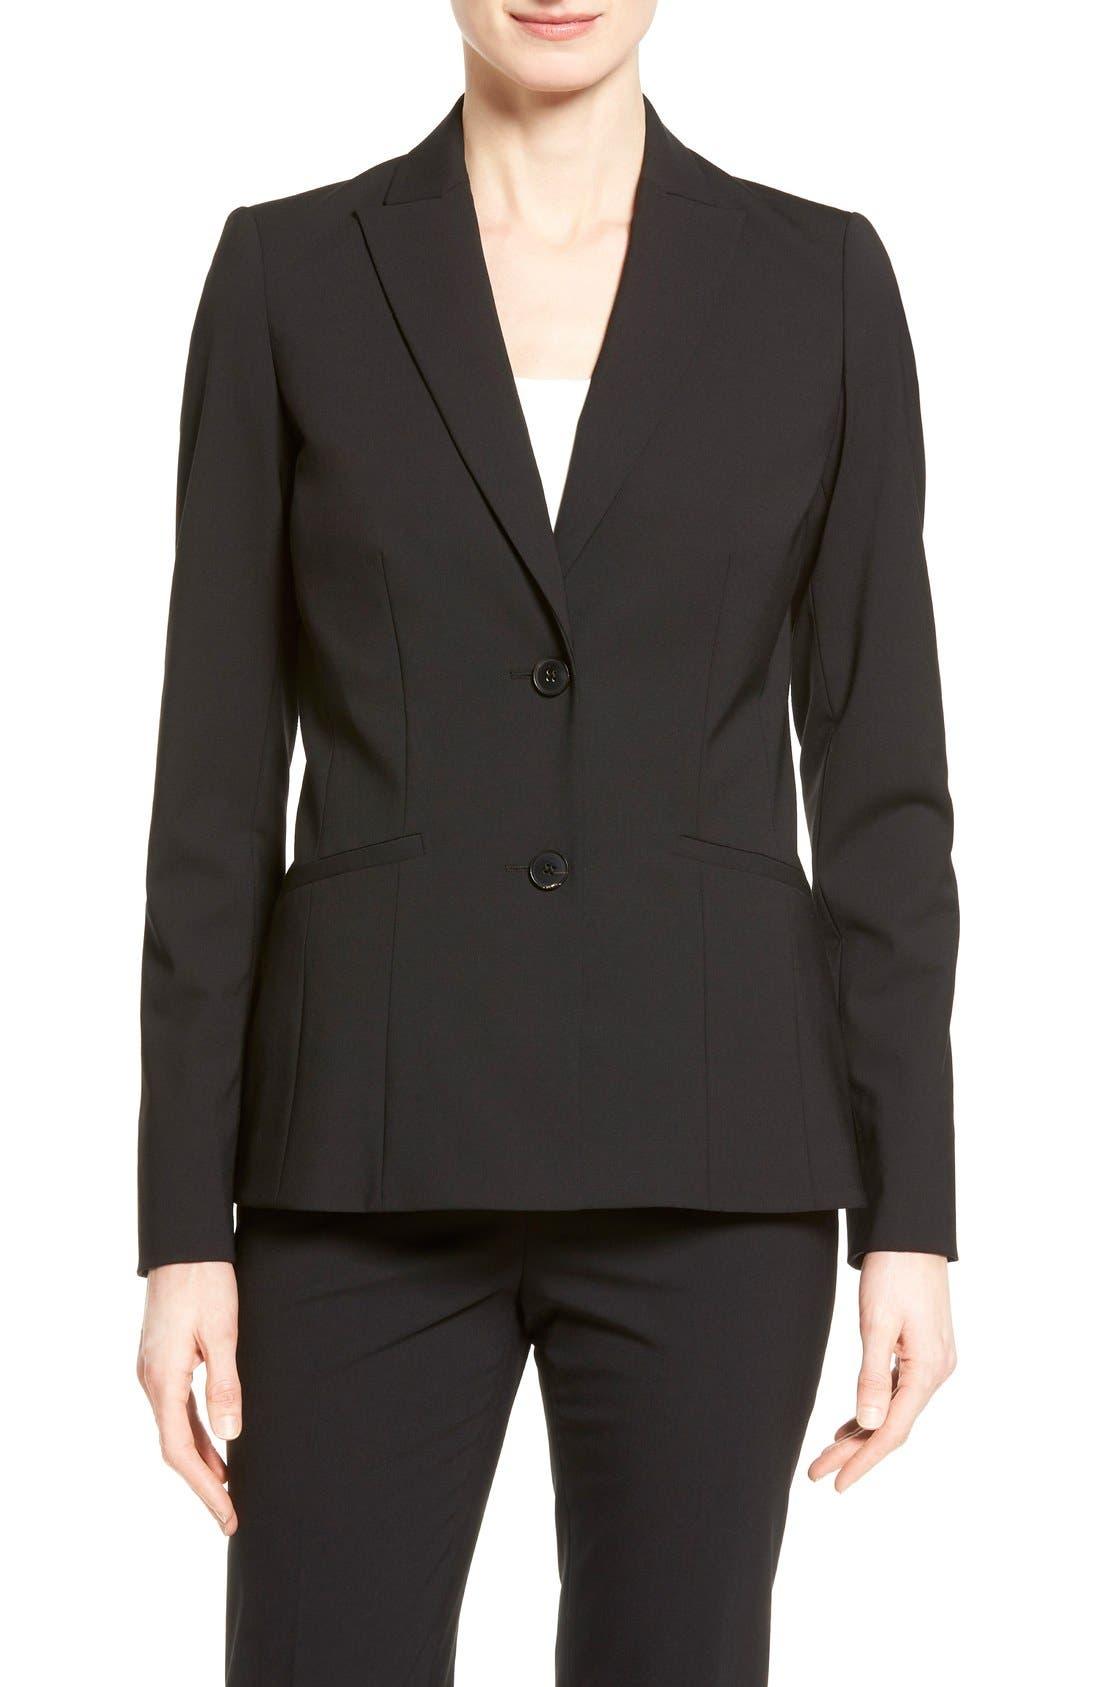 Alternate Image 1 Selected - Lafayette 148 New York 'Rhonda' Stretch Wool Jacket